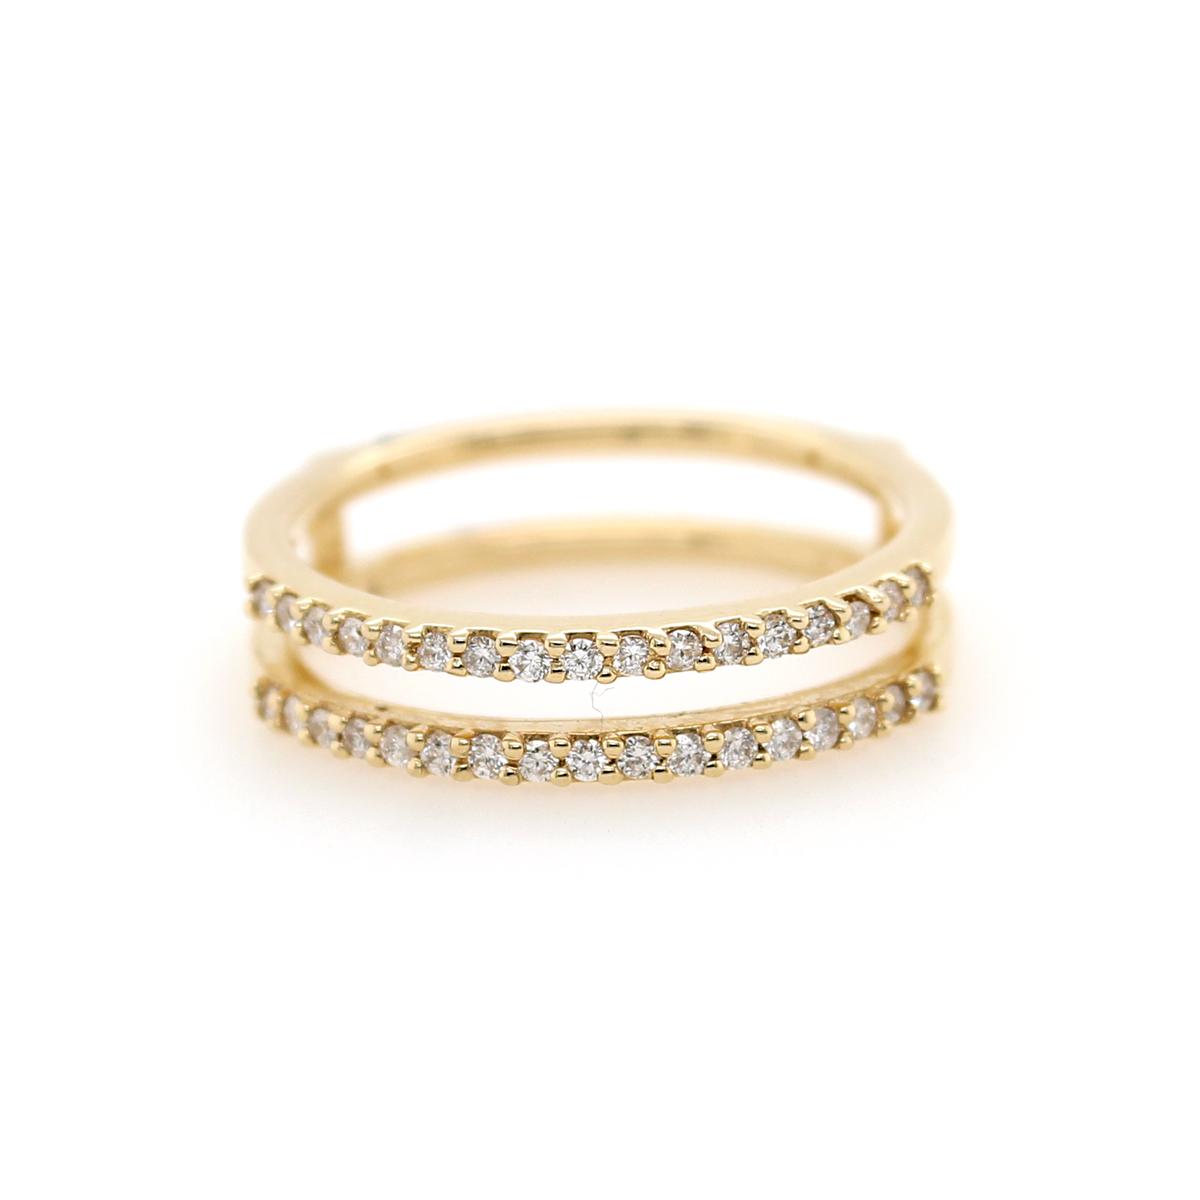 Shefi Diamonds 14 Karat Yellow Gold .25 Carat Diamond Ring Jacket